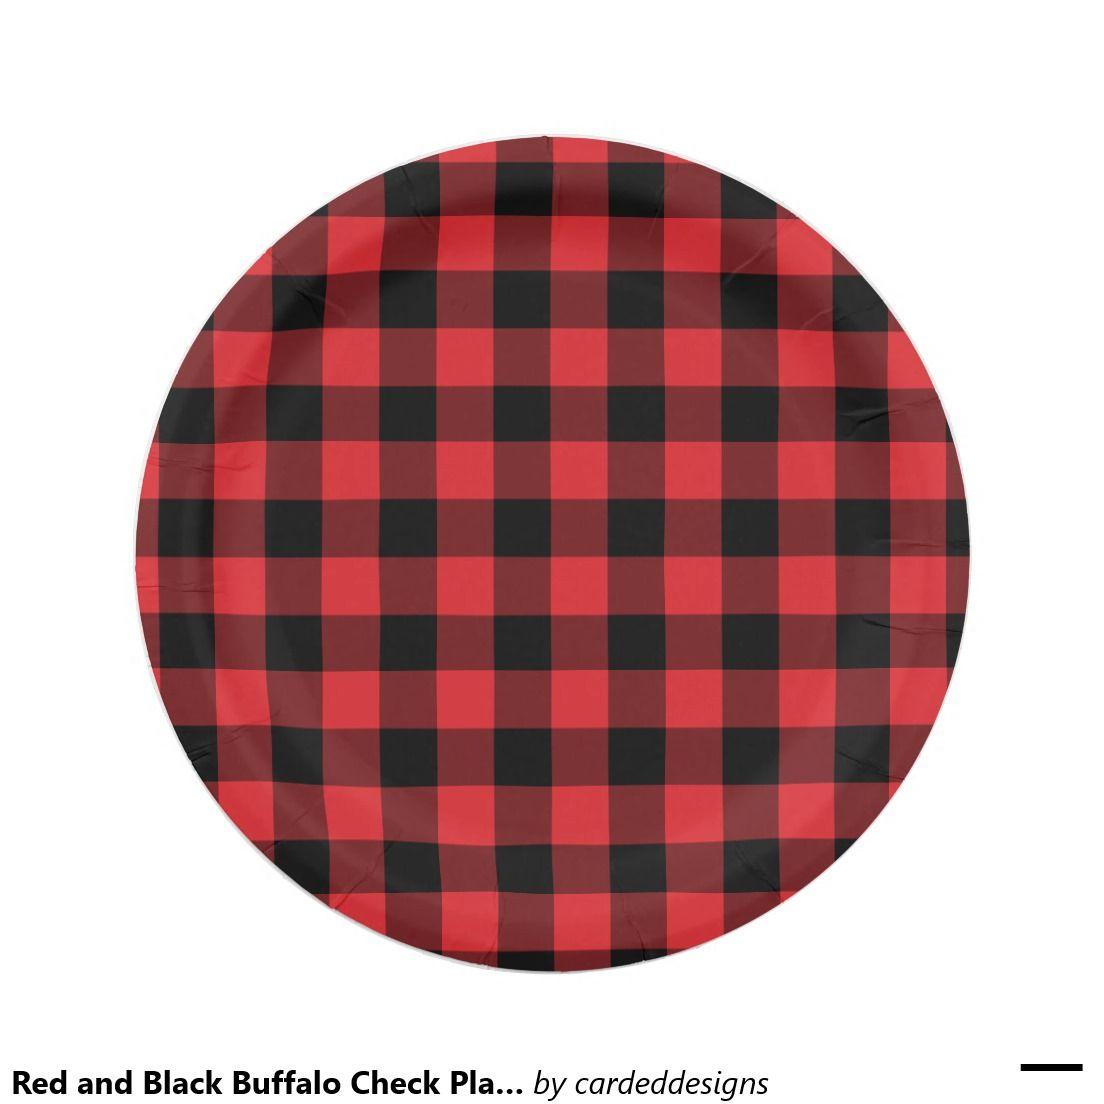 Red And Black Buffalo Check Plaid Pattern Paper Plate Zazzle Com Buffalo Check Plaid Plaid Pattern Red And Black Plaid